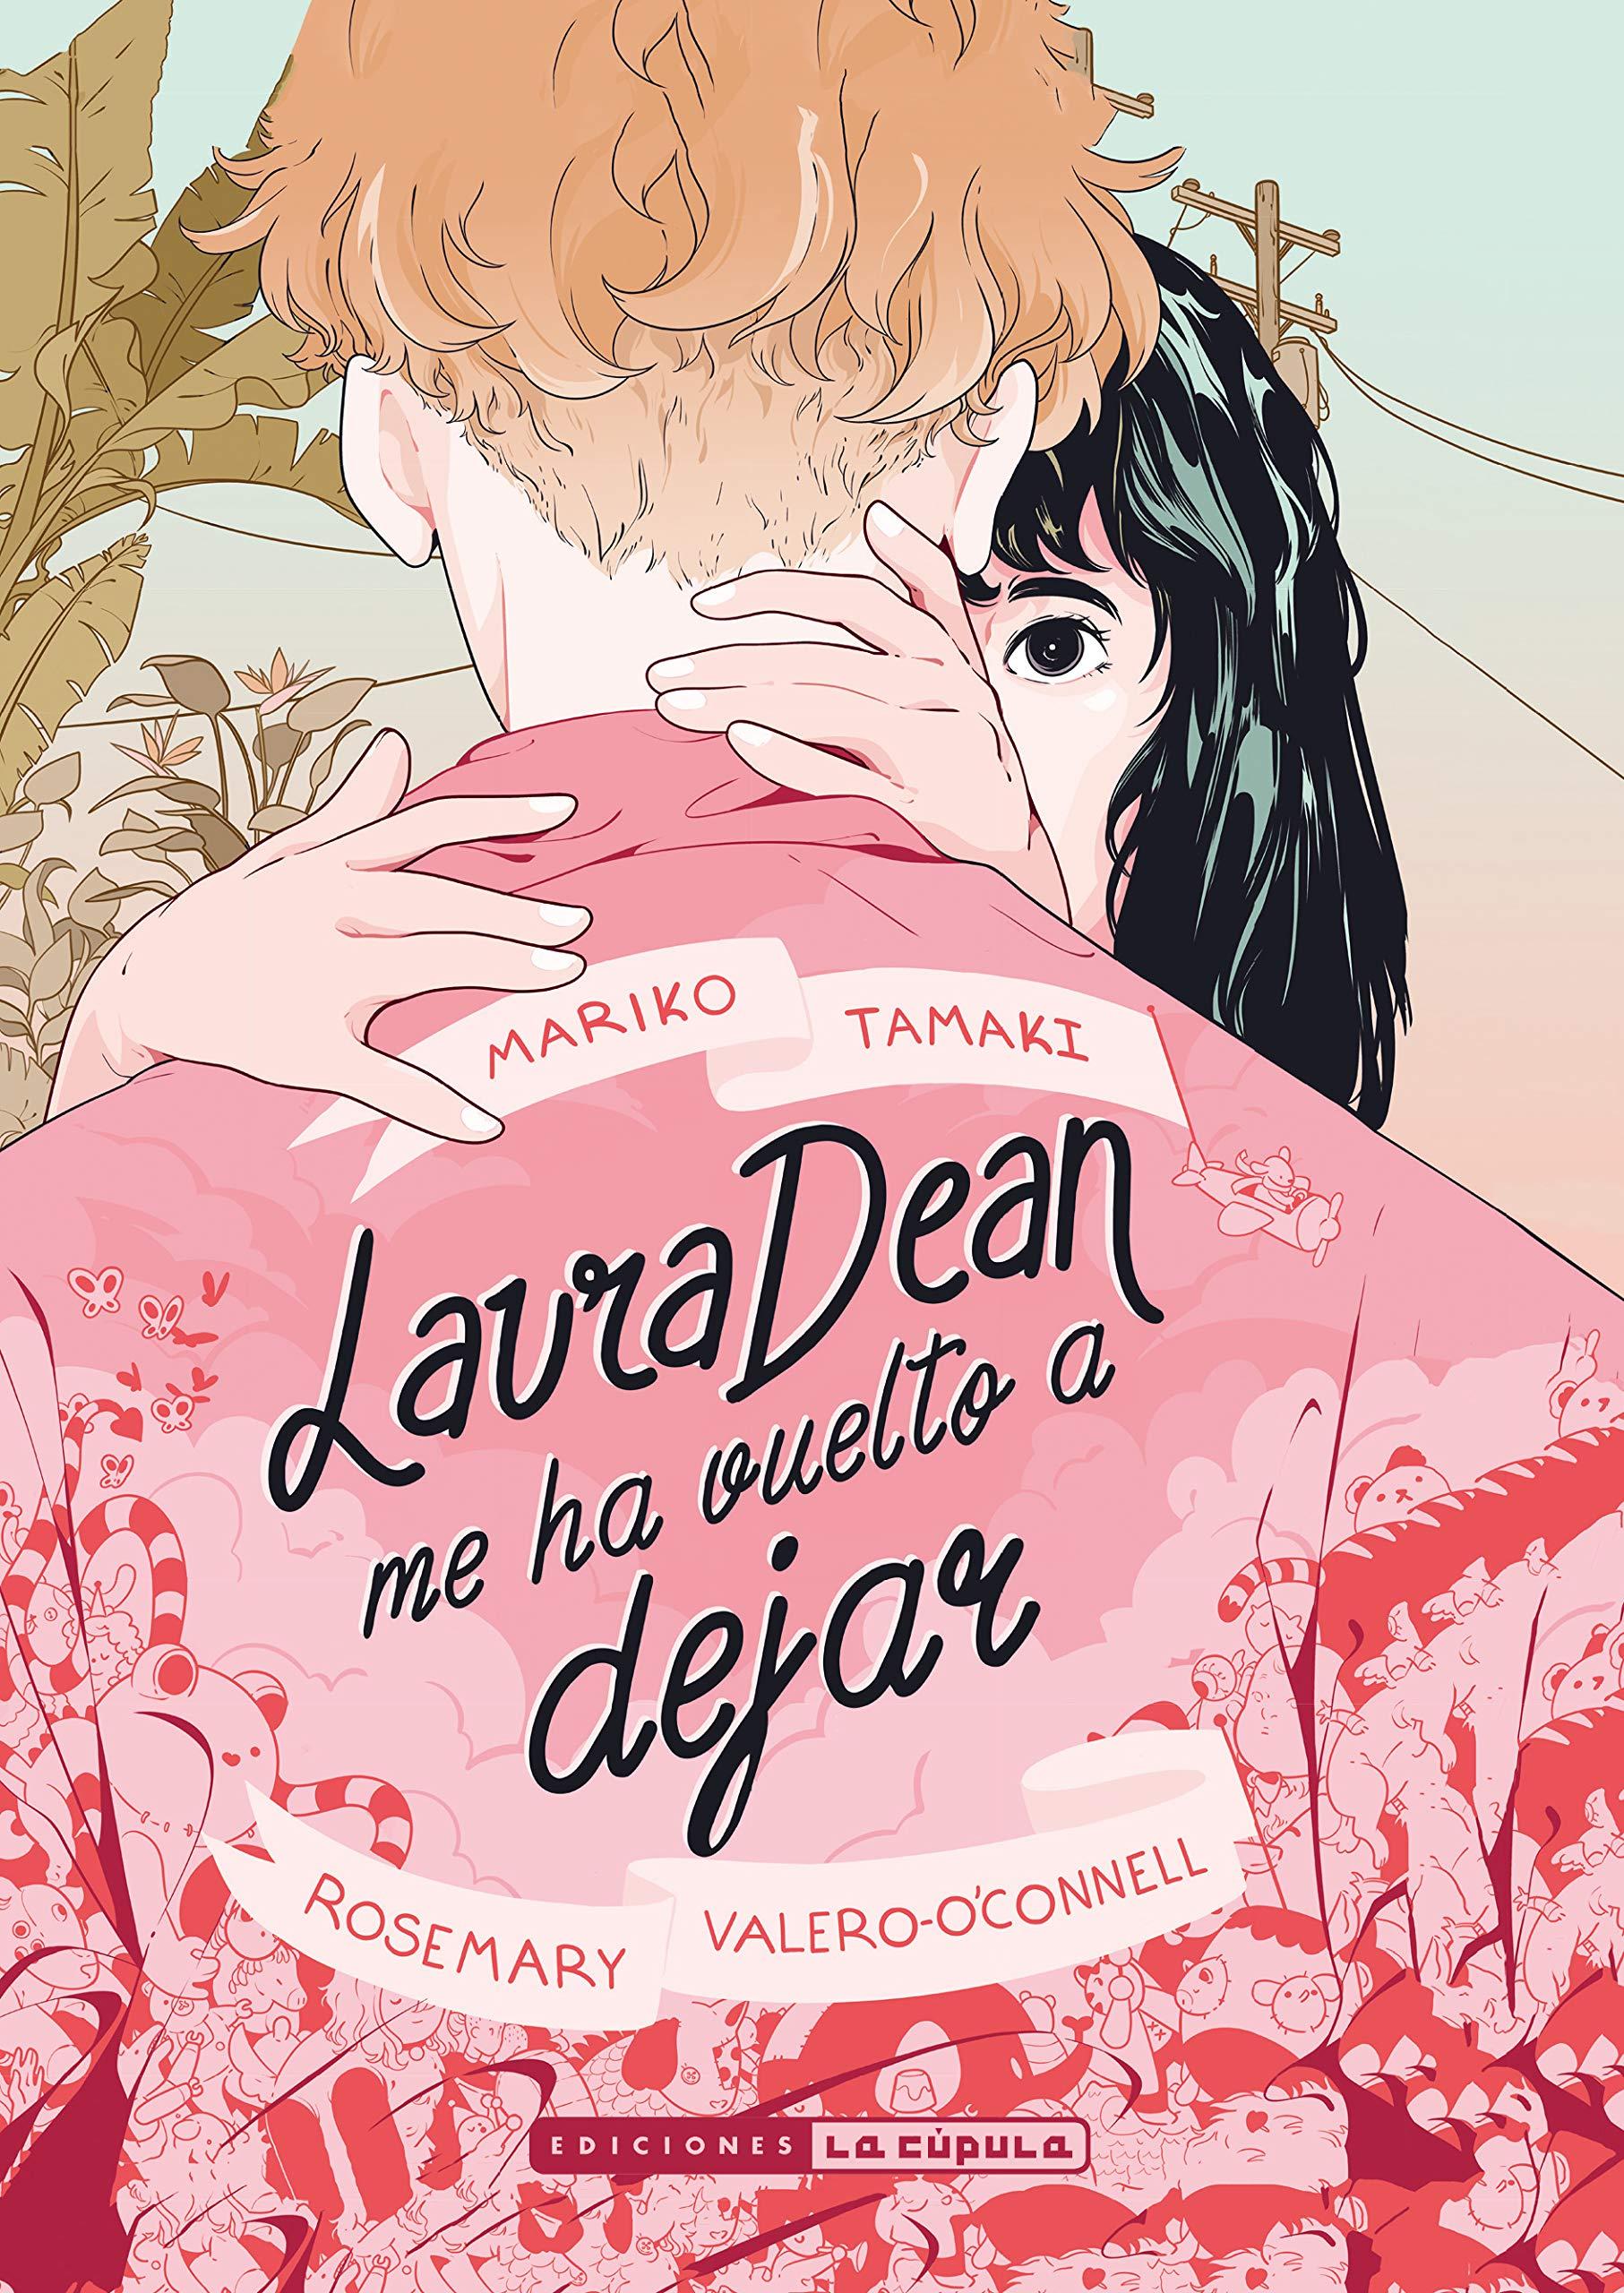 Laura Dean me ha vuelto a dejar